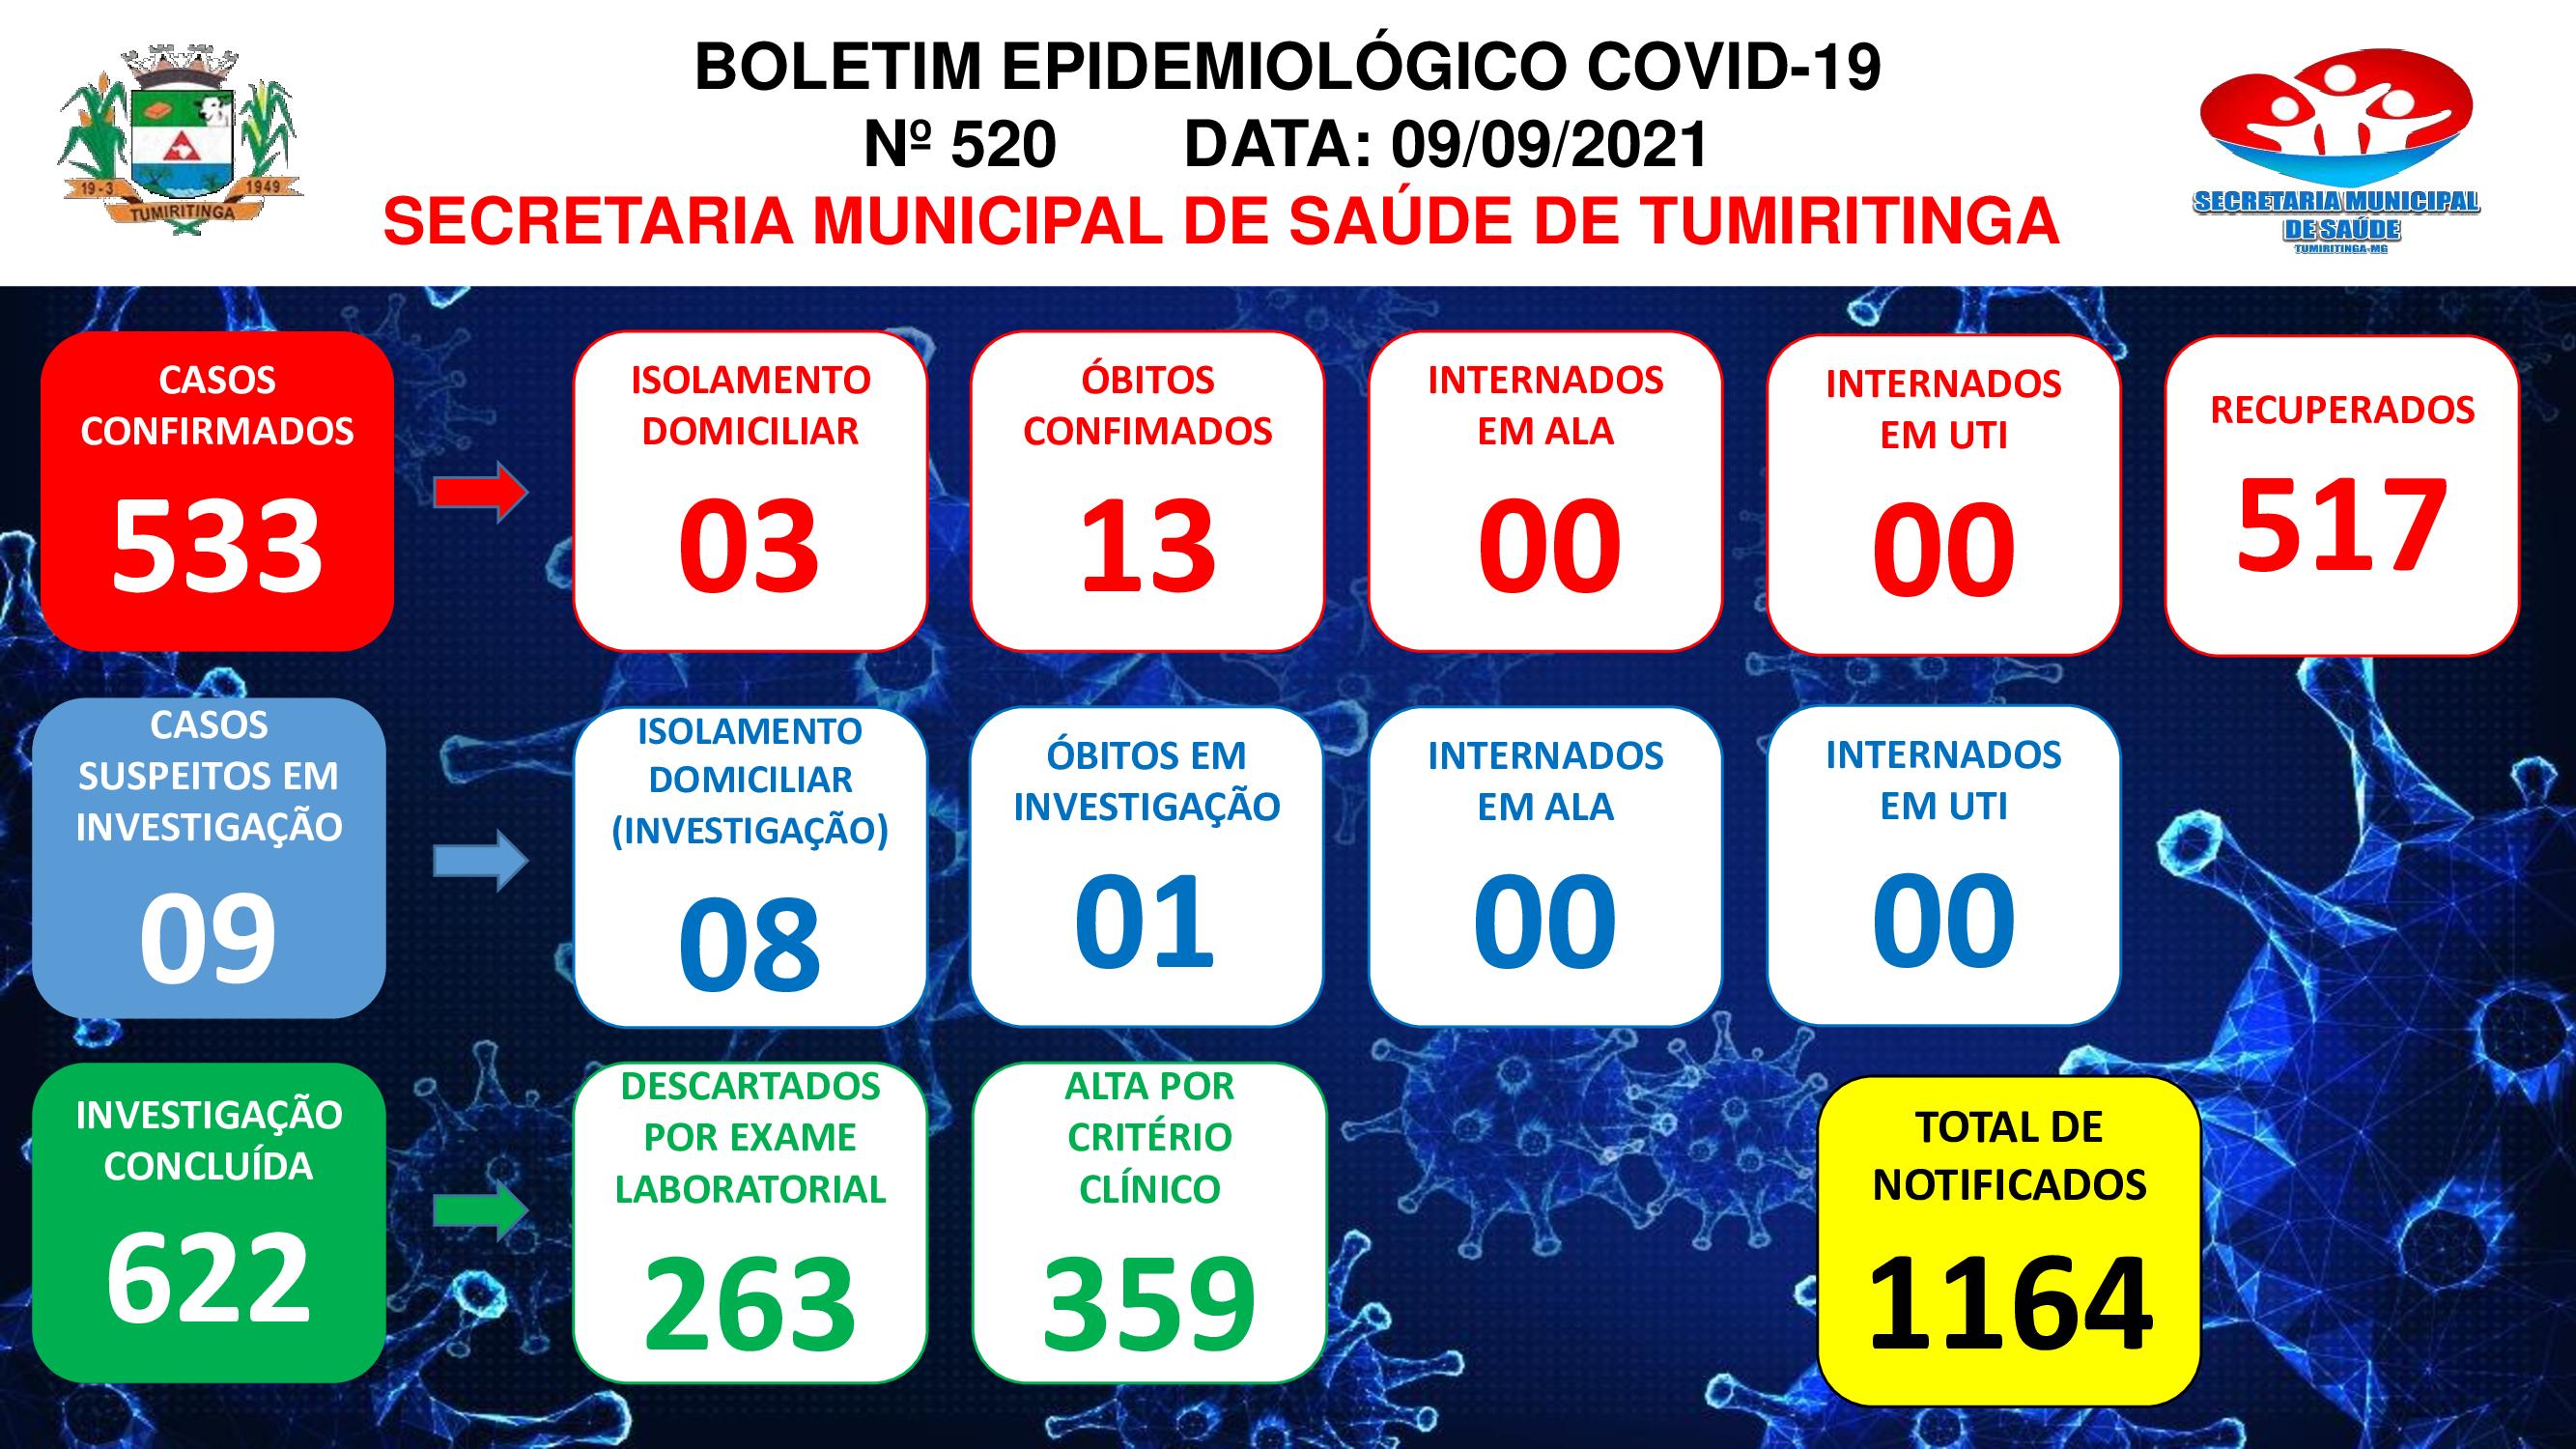 BOLETIM EPIDEMIOLÓGICO CORONAVÍRUS N° 520- 09/09/2021